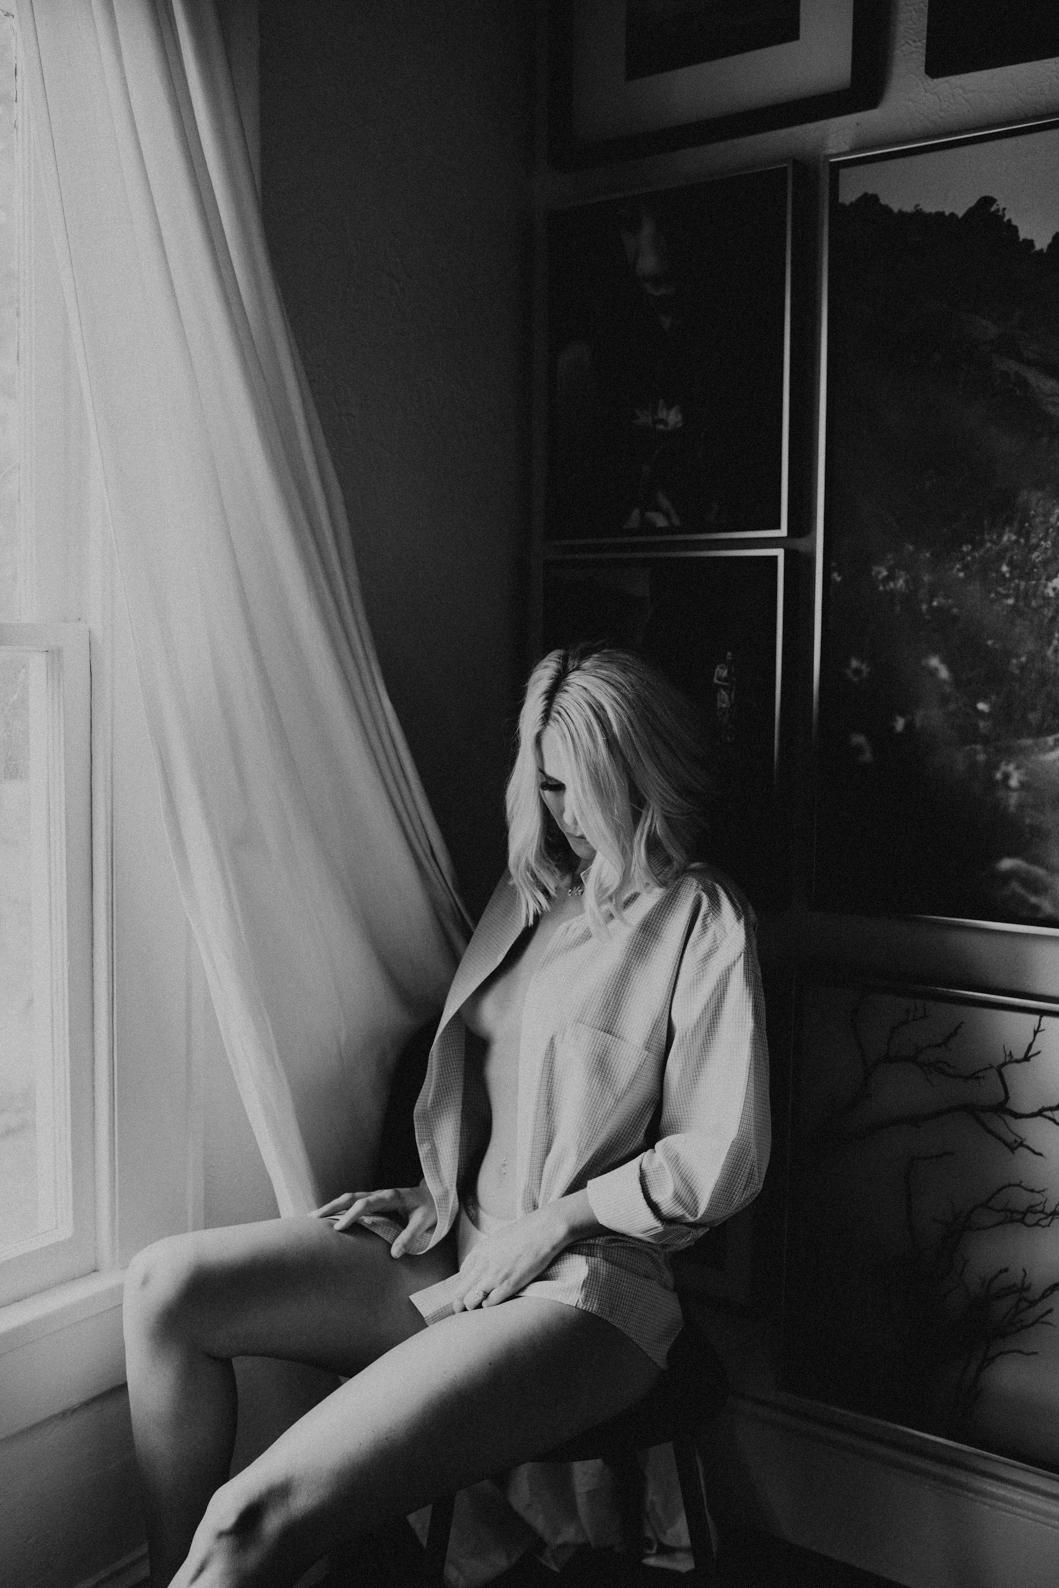 Charlotte-Boudoir Photographers-Boudoir-lintime-4 2.jpg